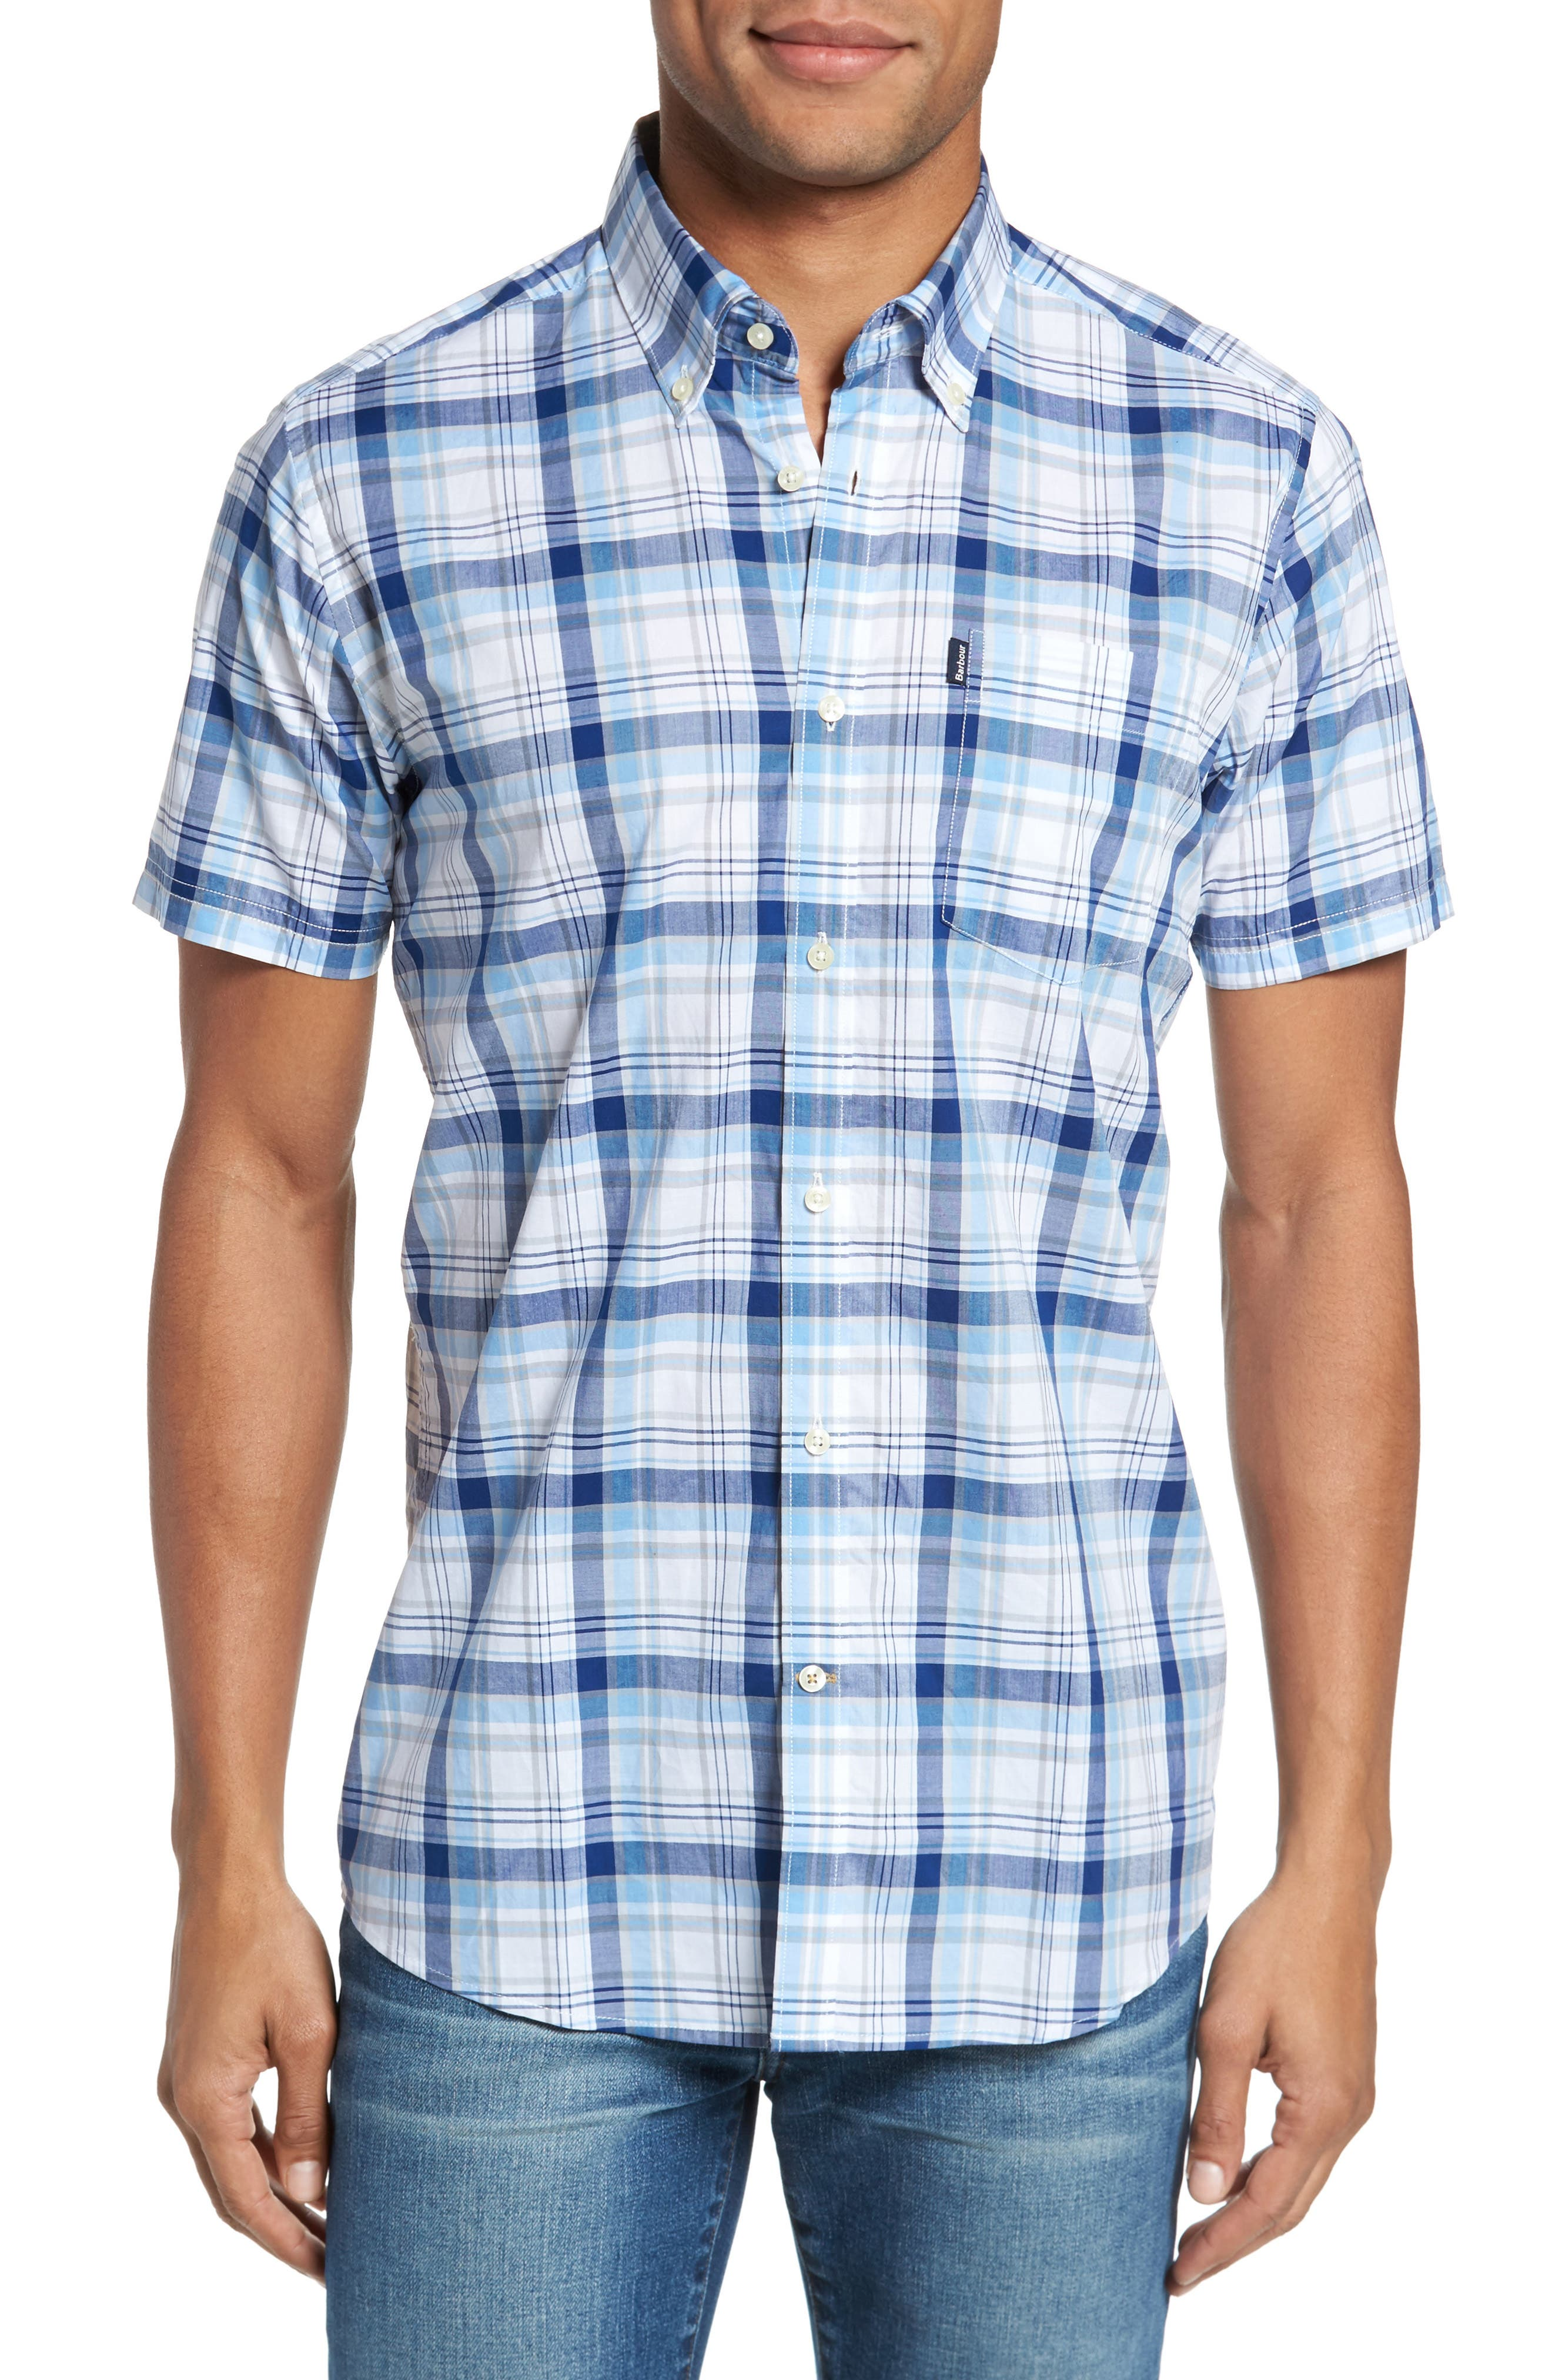 Gerald Tailored Fit Plaid Sport Shirt,                             Main thumbnail 1, color,                             450